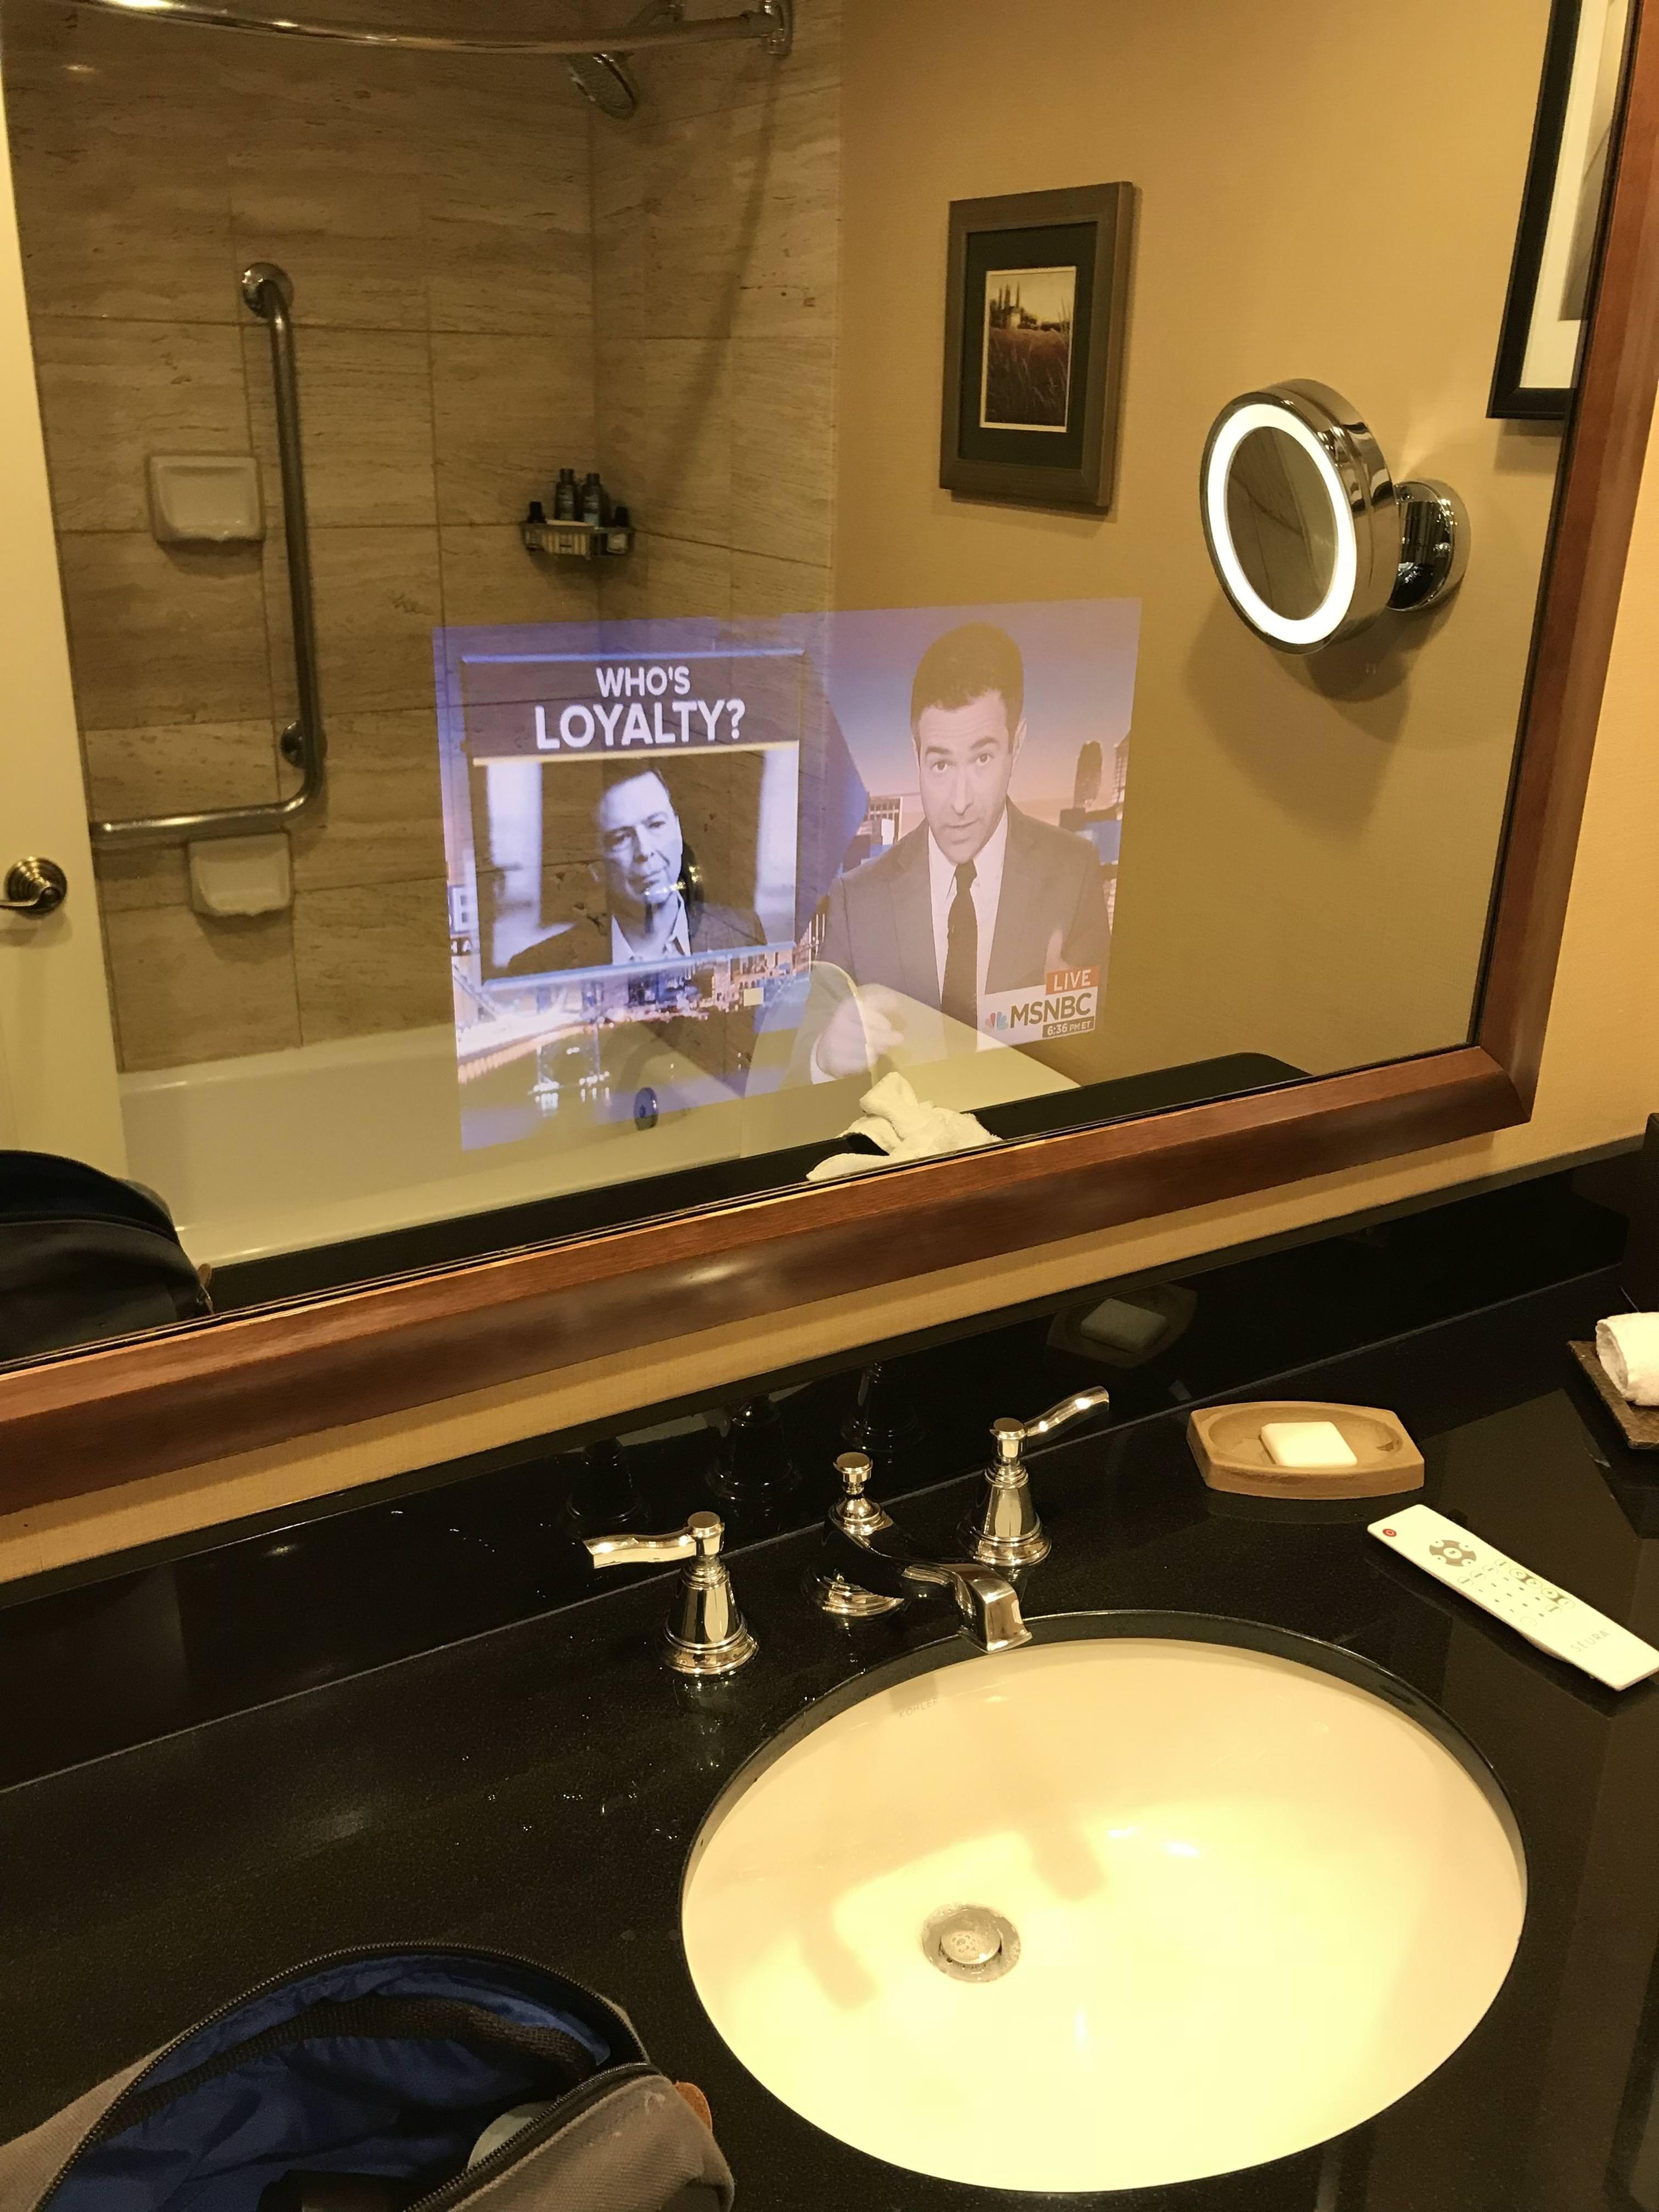 My Hotel Room Has A Tv Inside The Bathroom Mirror Hotels Room